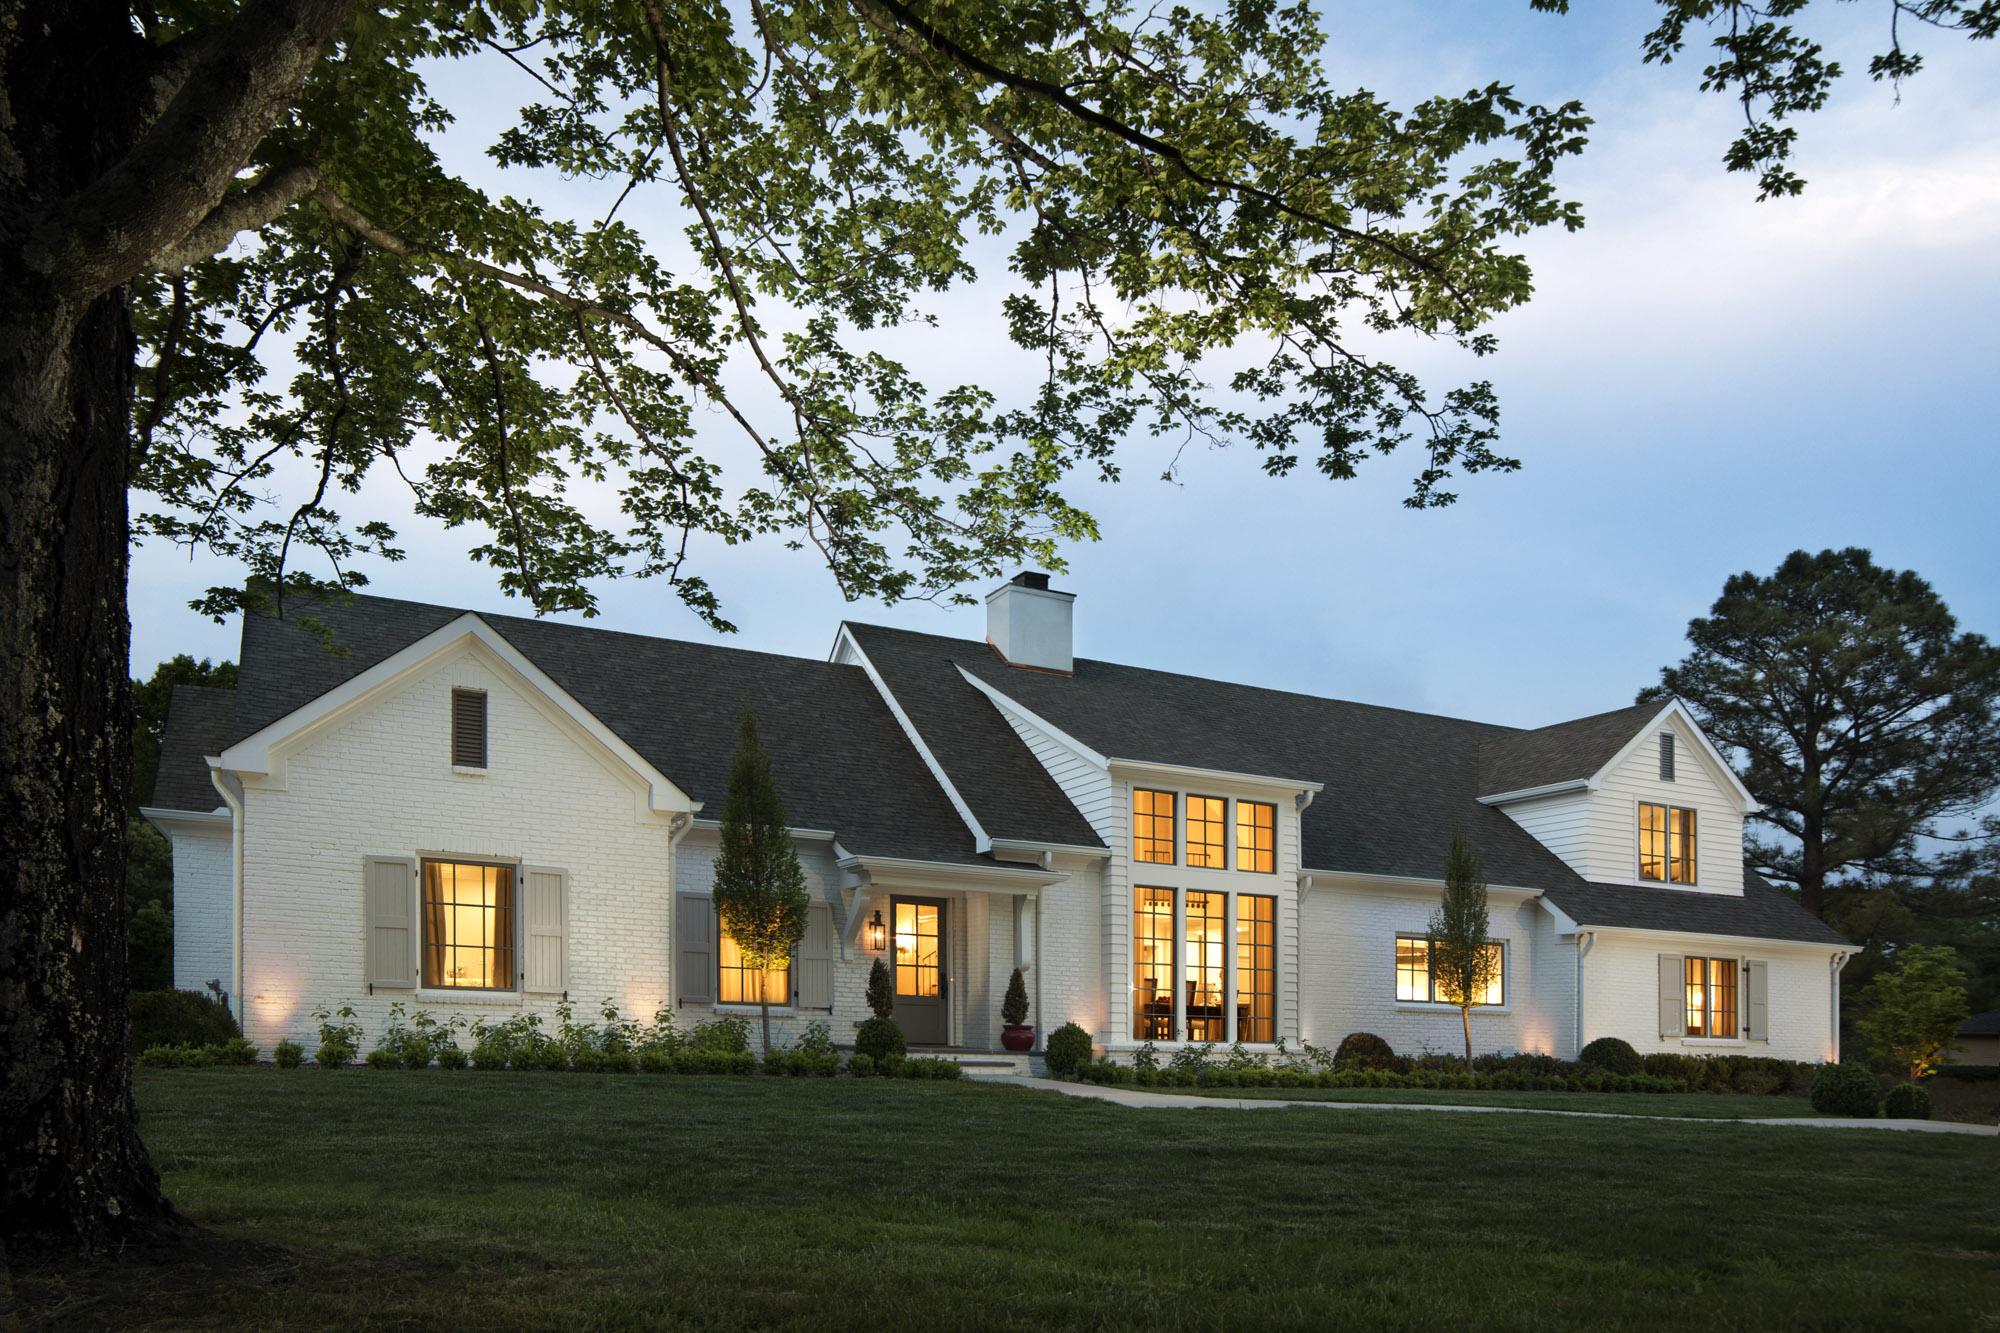 Fielder Williams Strain fiwist Nashville Architecture Photographer house twilight001.jpg